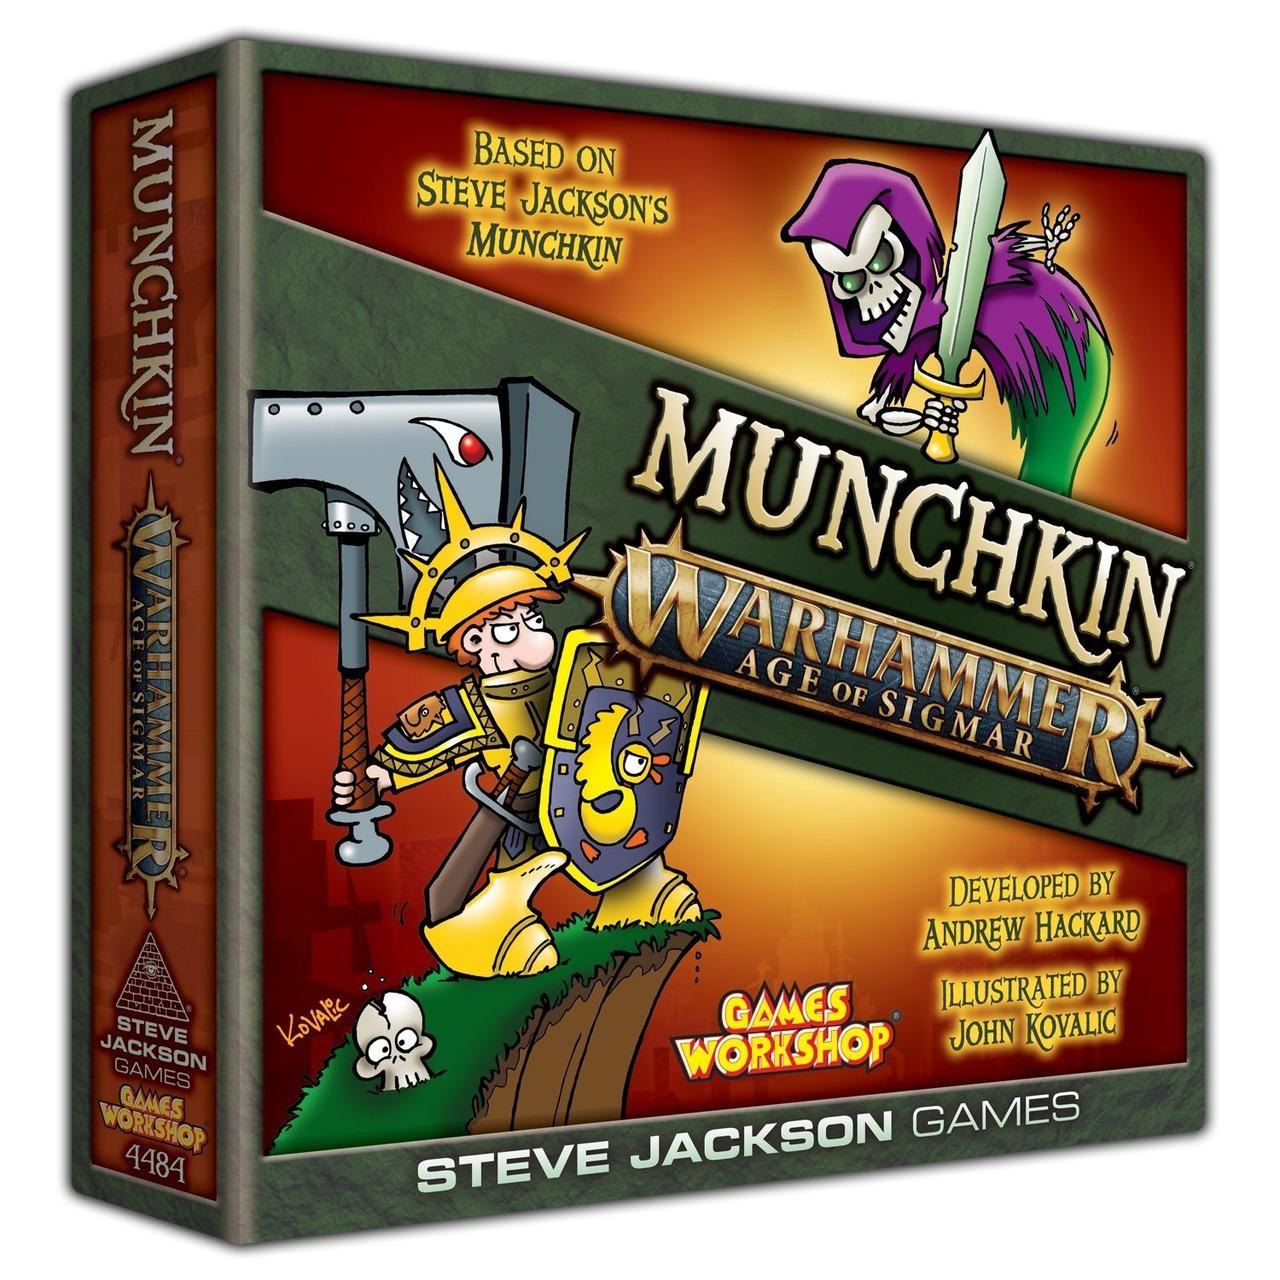 Munchkin Warhammer 40.000 et AoS 13QsjrU05y8